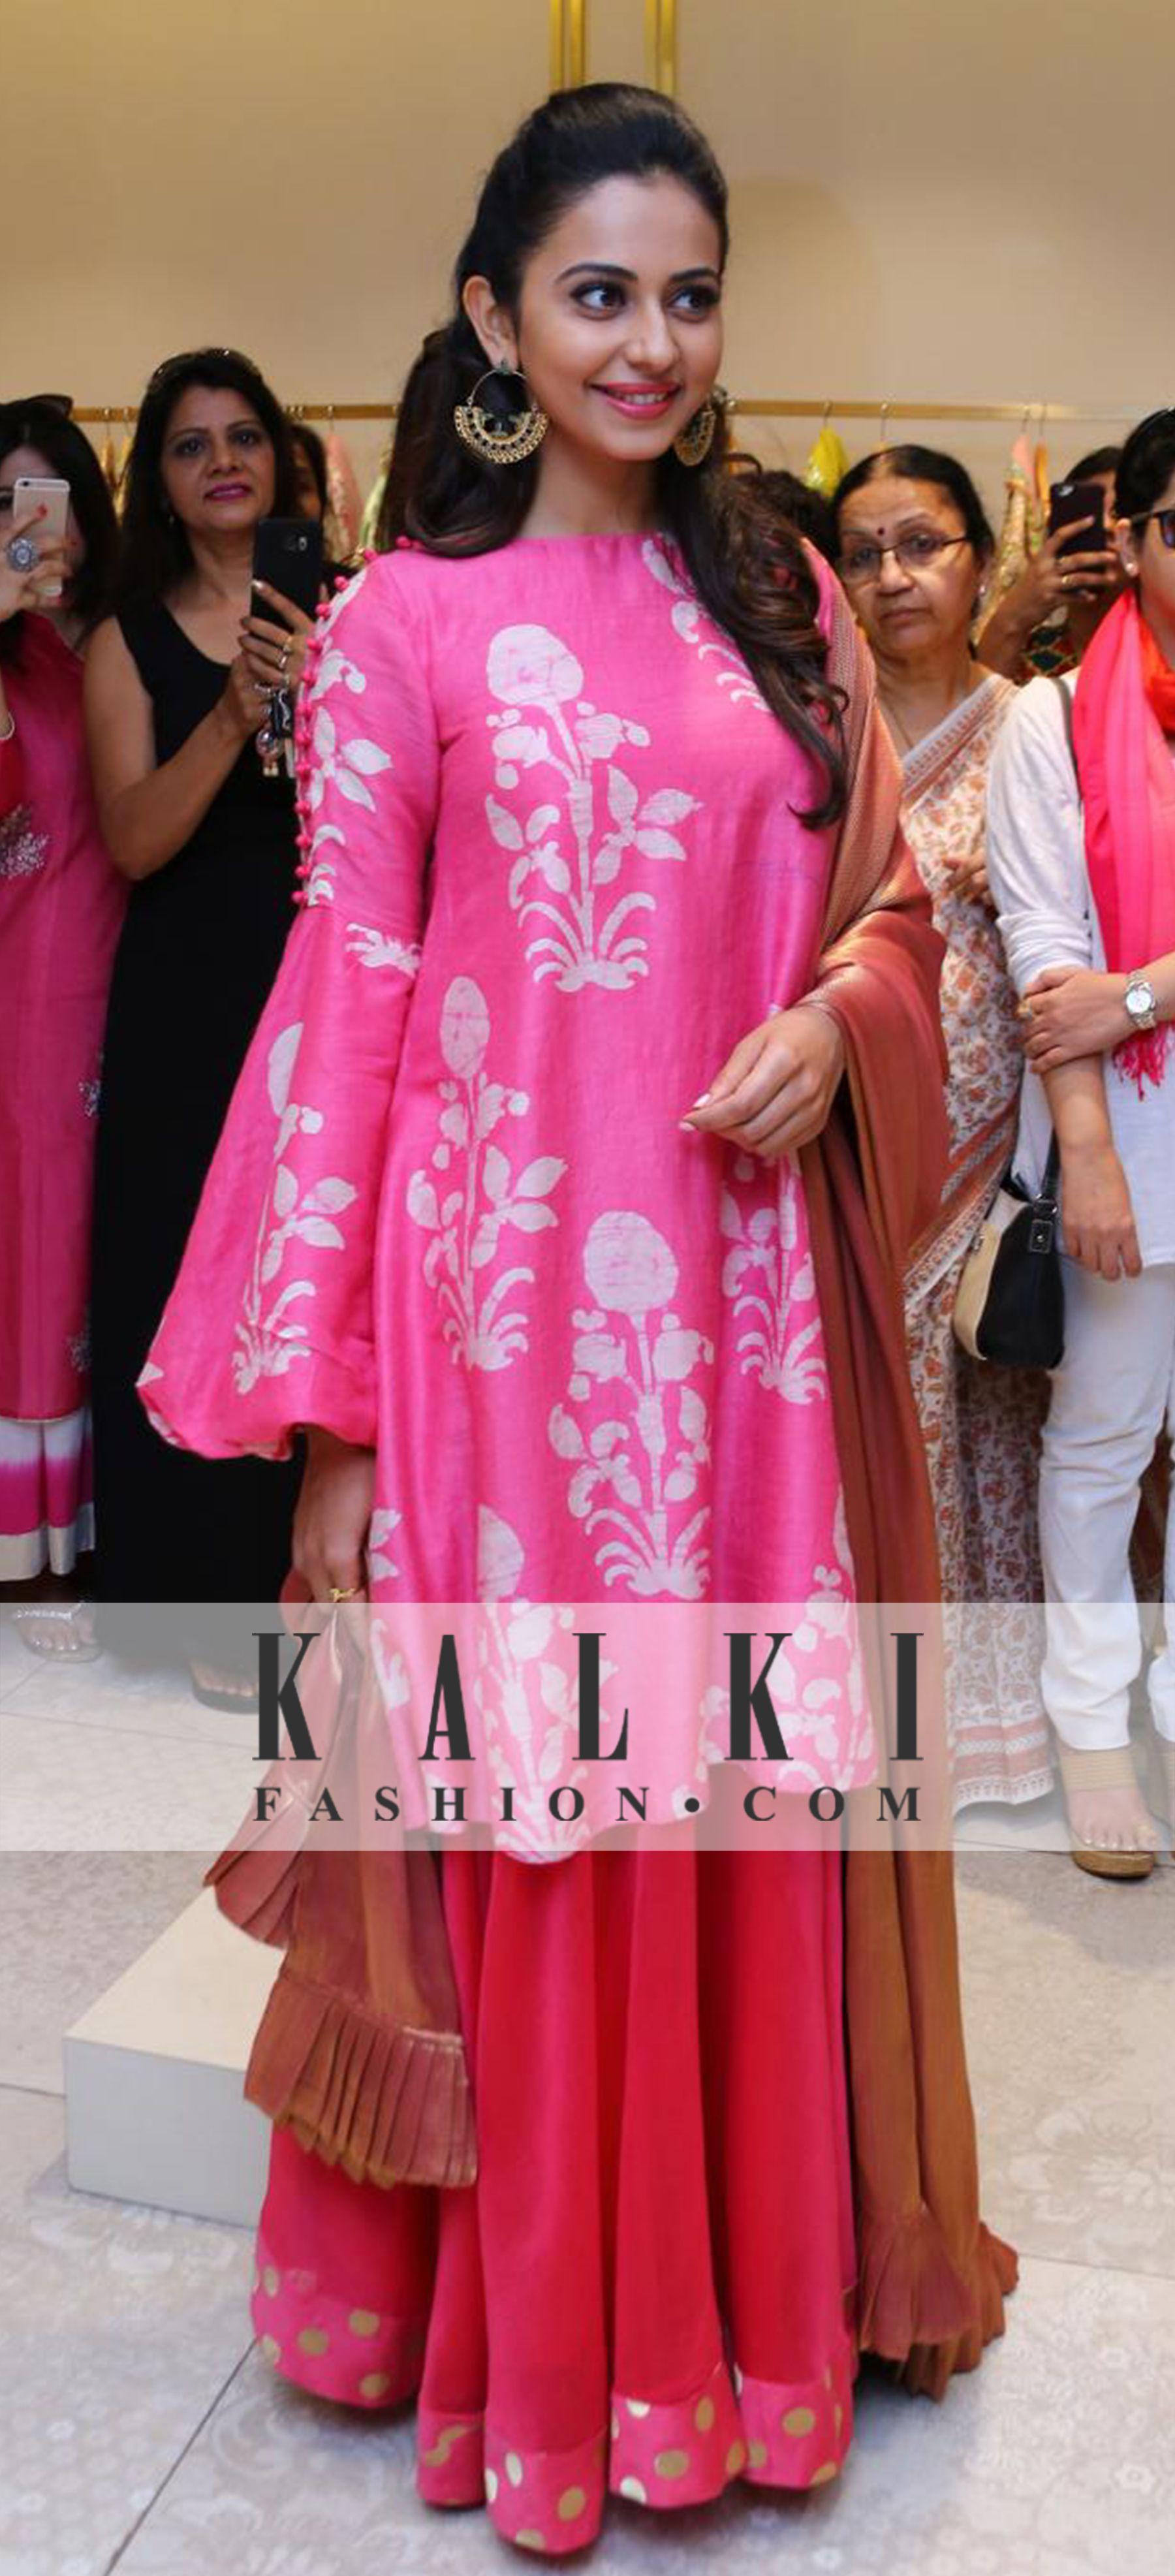 Pin de Poonam Panchal en fashion | Pinterest | Artistas